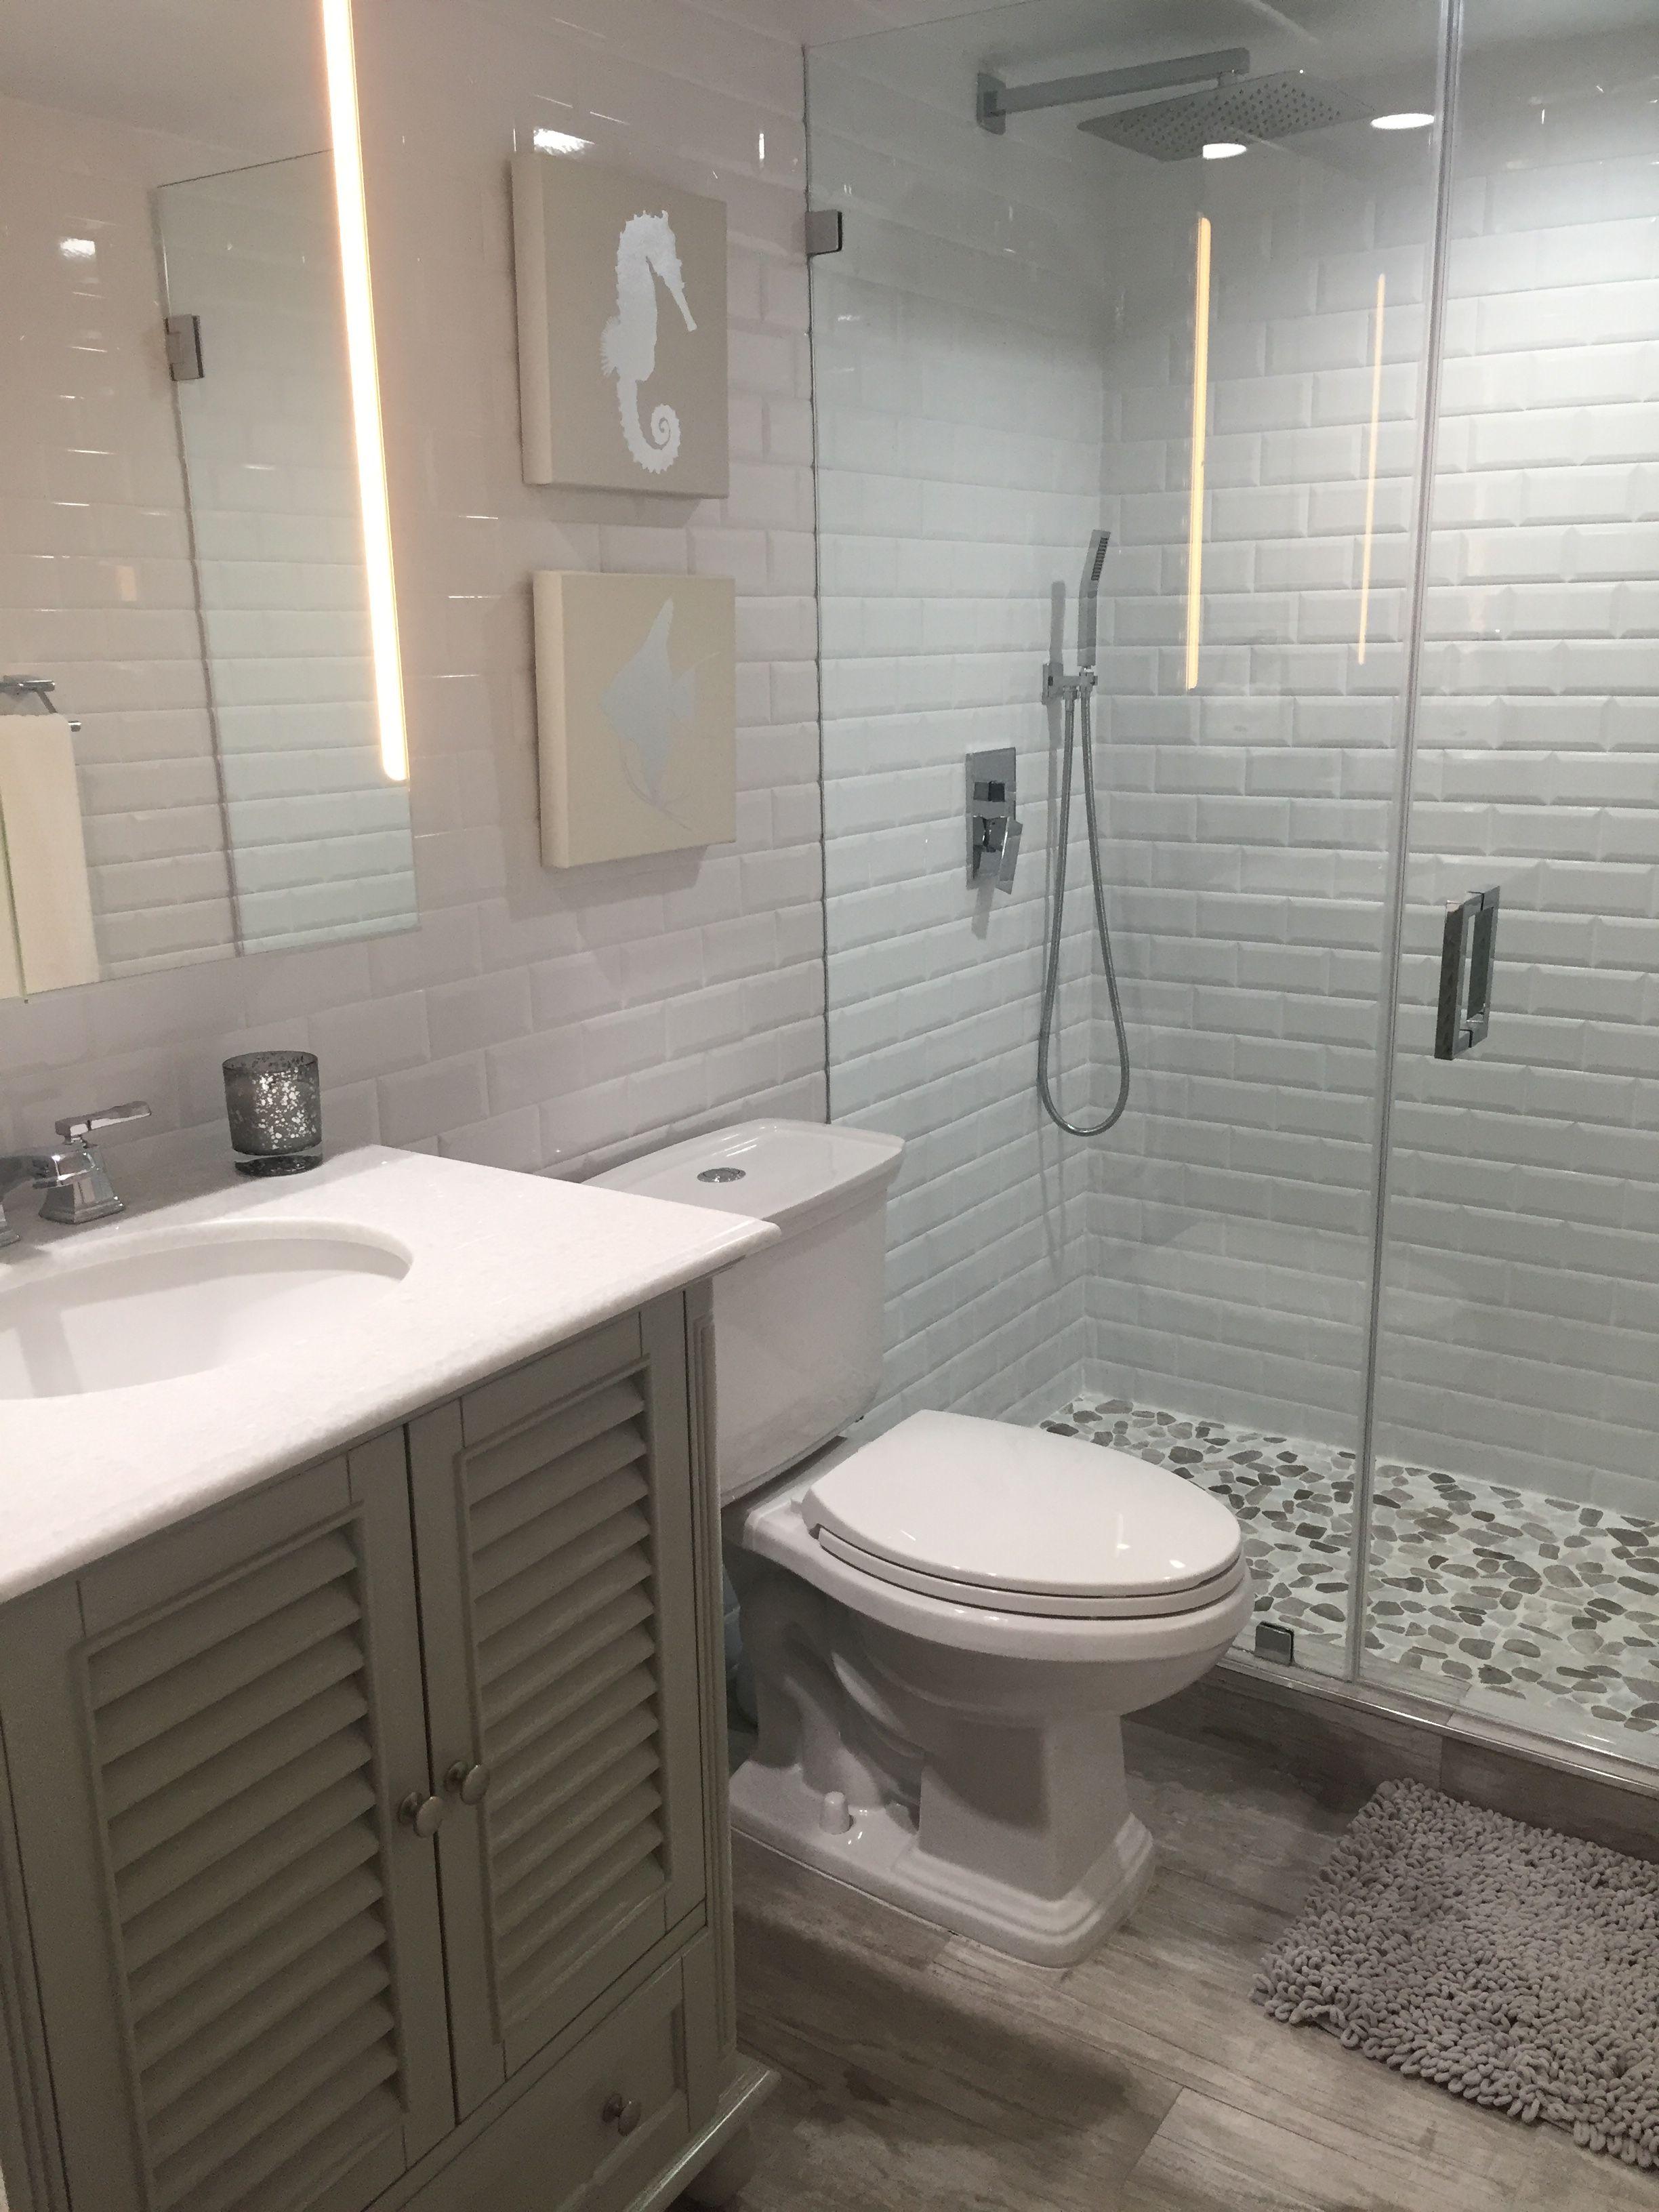 Best Kitchen Gallery: Bathroom Ideas Bathroom Remodel Condo Bathroom Remodel Small of Designing A Bathroom Remodel  on rachelxblog.com